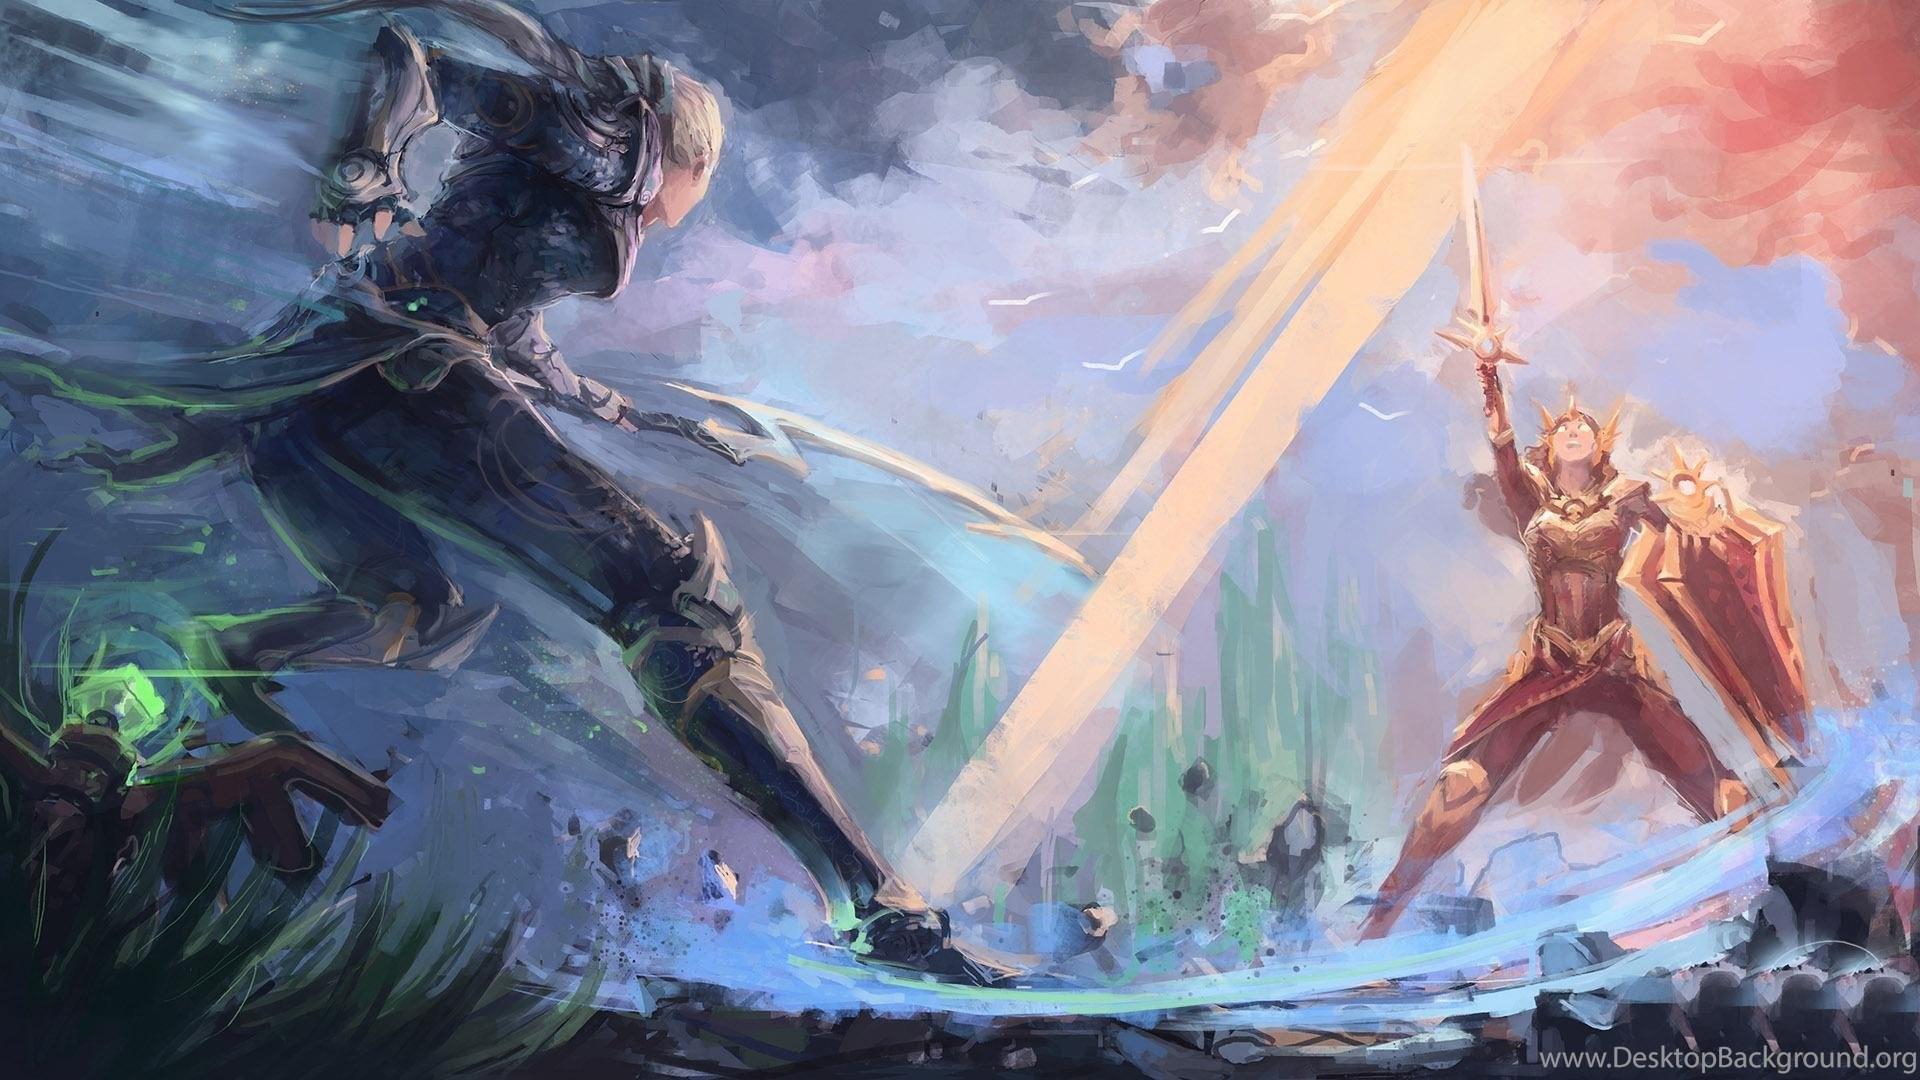 Leona Fighting Diana In League Of Legends Hd Desktop Wallpapers